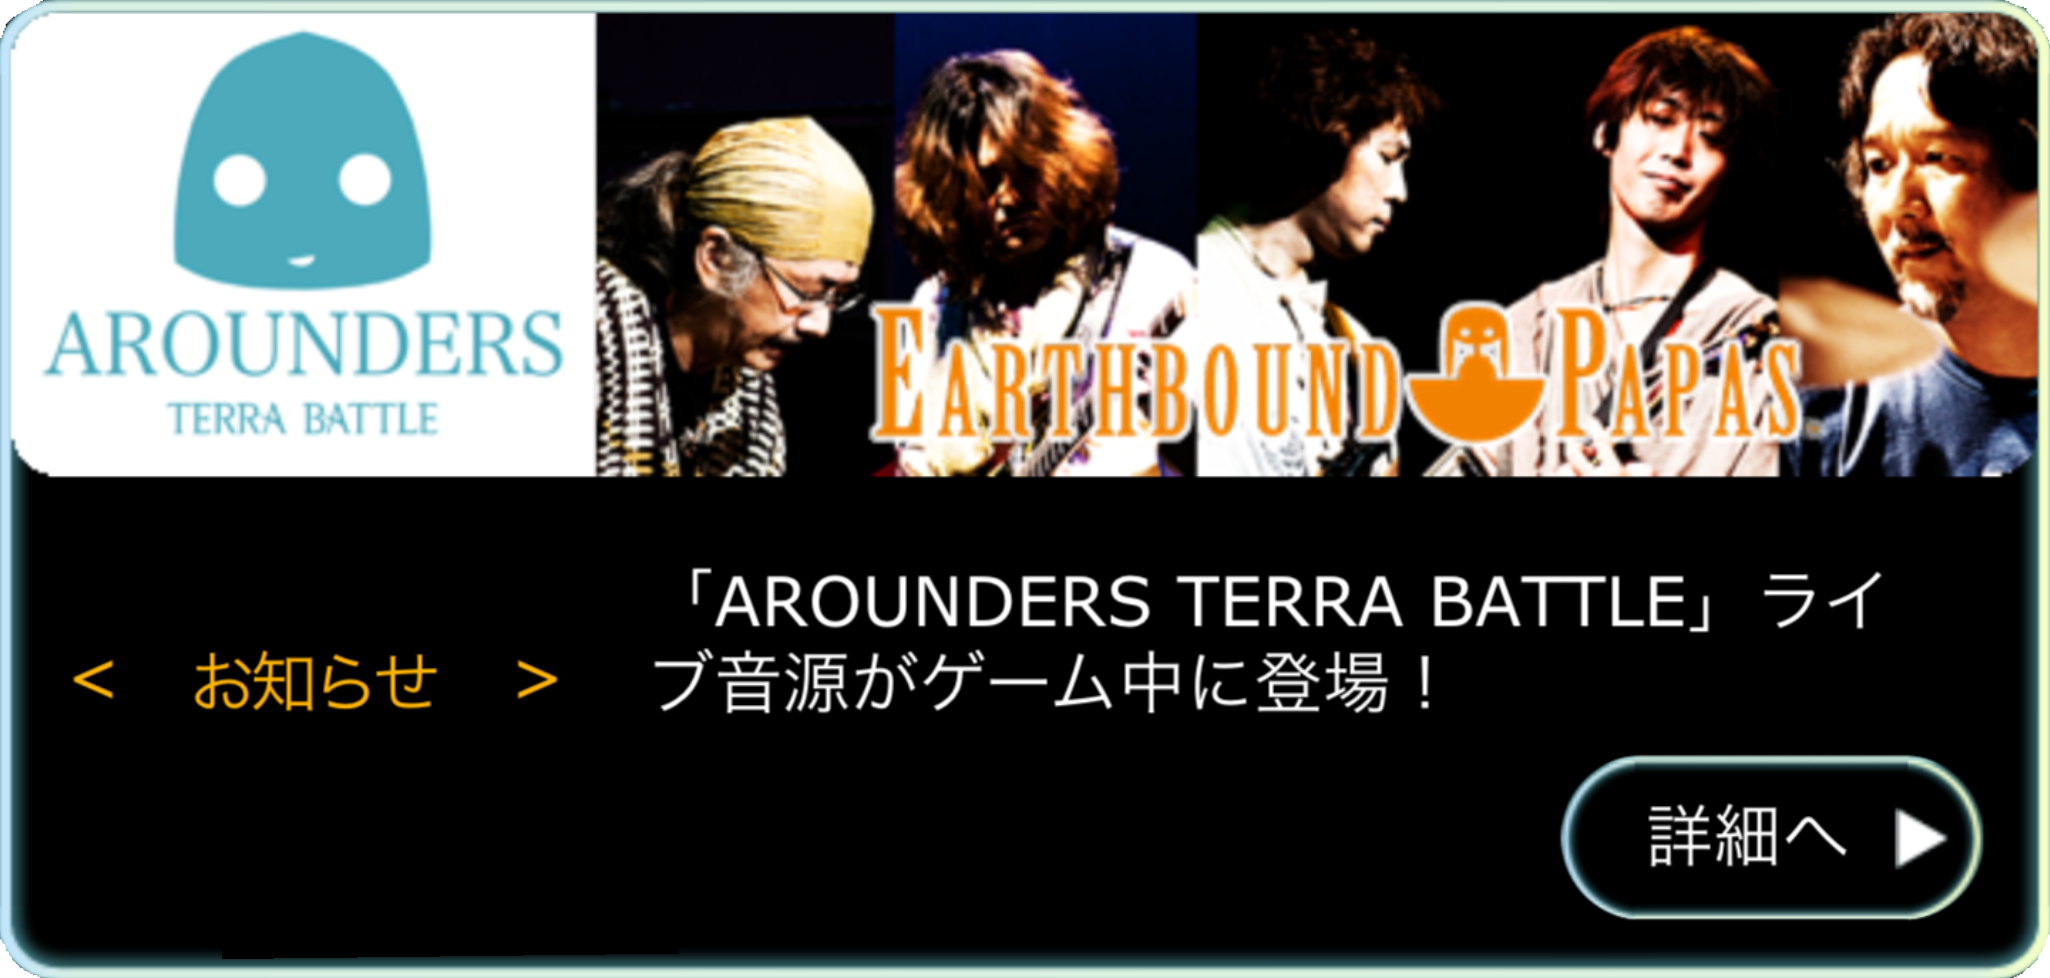 「AROUNDERS TERRA BATTLE」ライブ音源がゲーム中に登場!